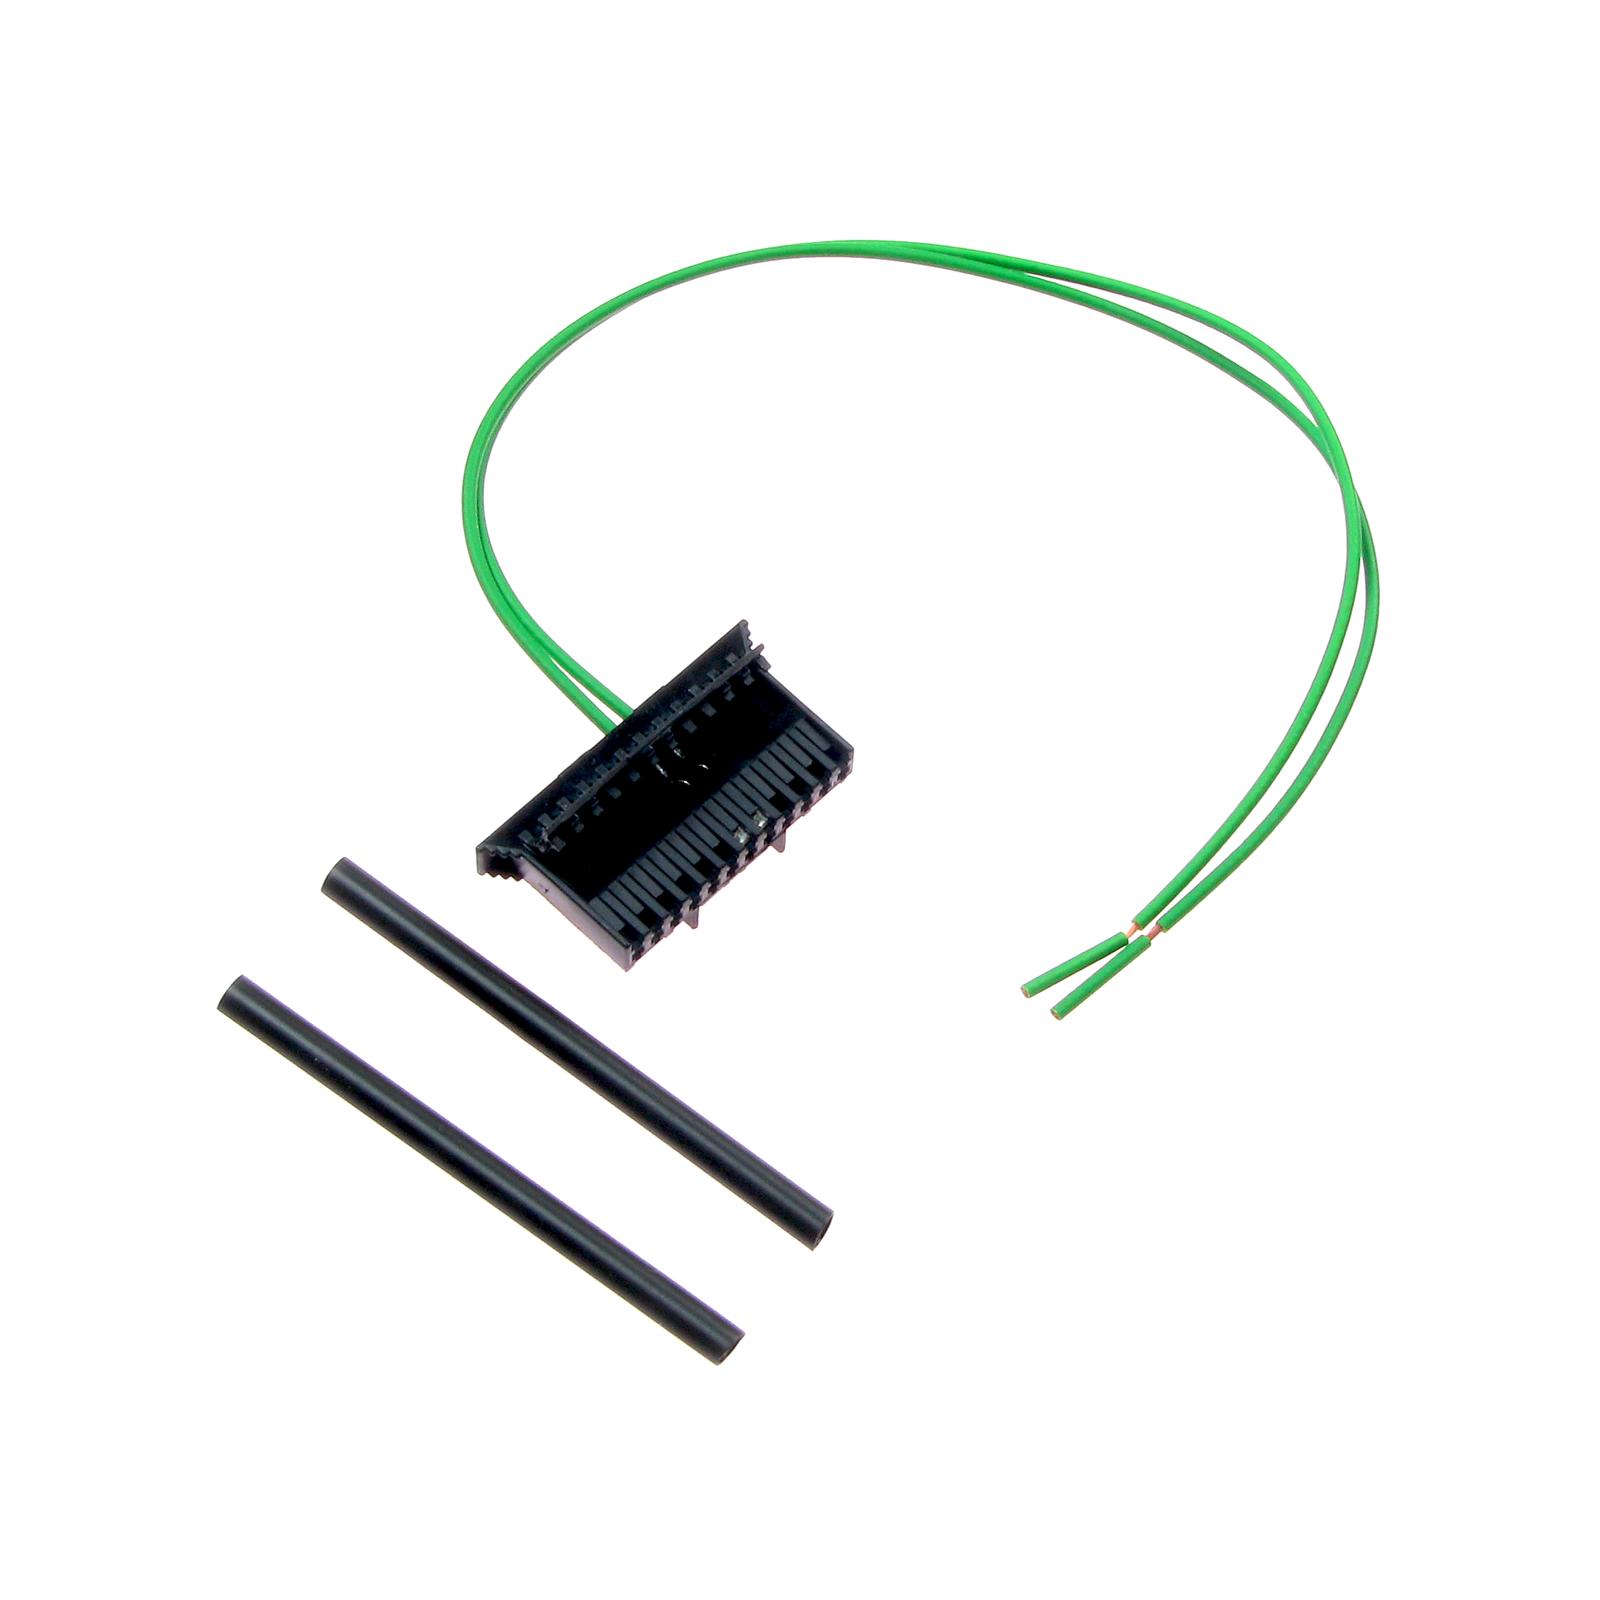 Repair Kit Ppa Black Connector Plug Headlights Fusebox For Renault Fuse Box Megane Ii